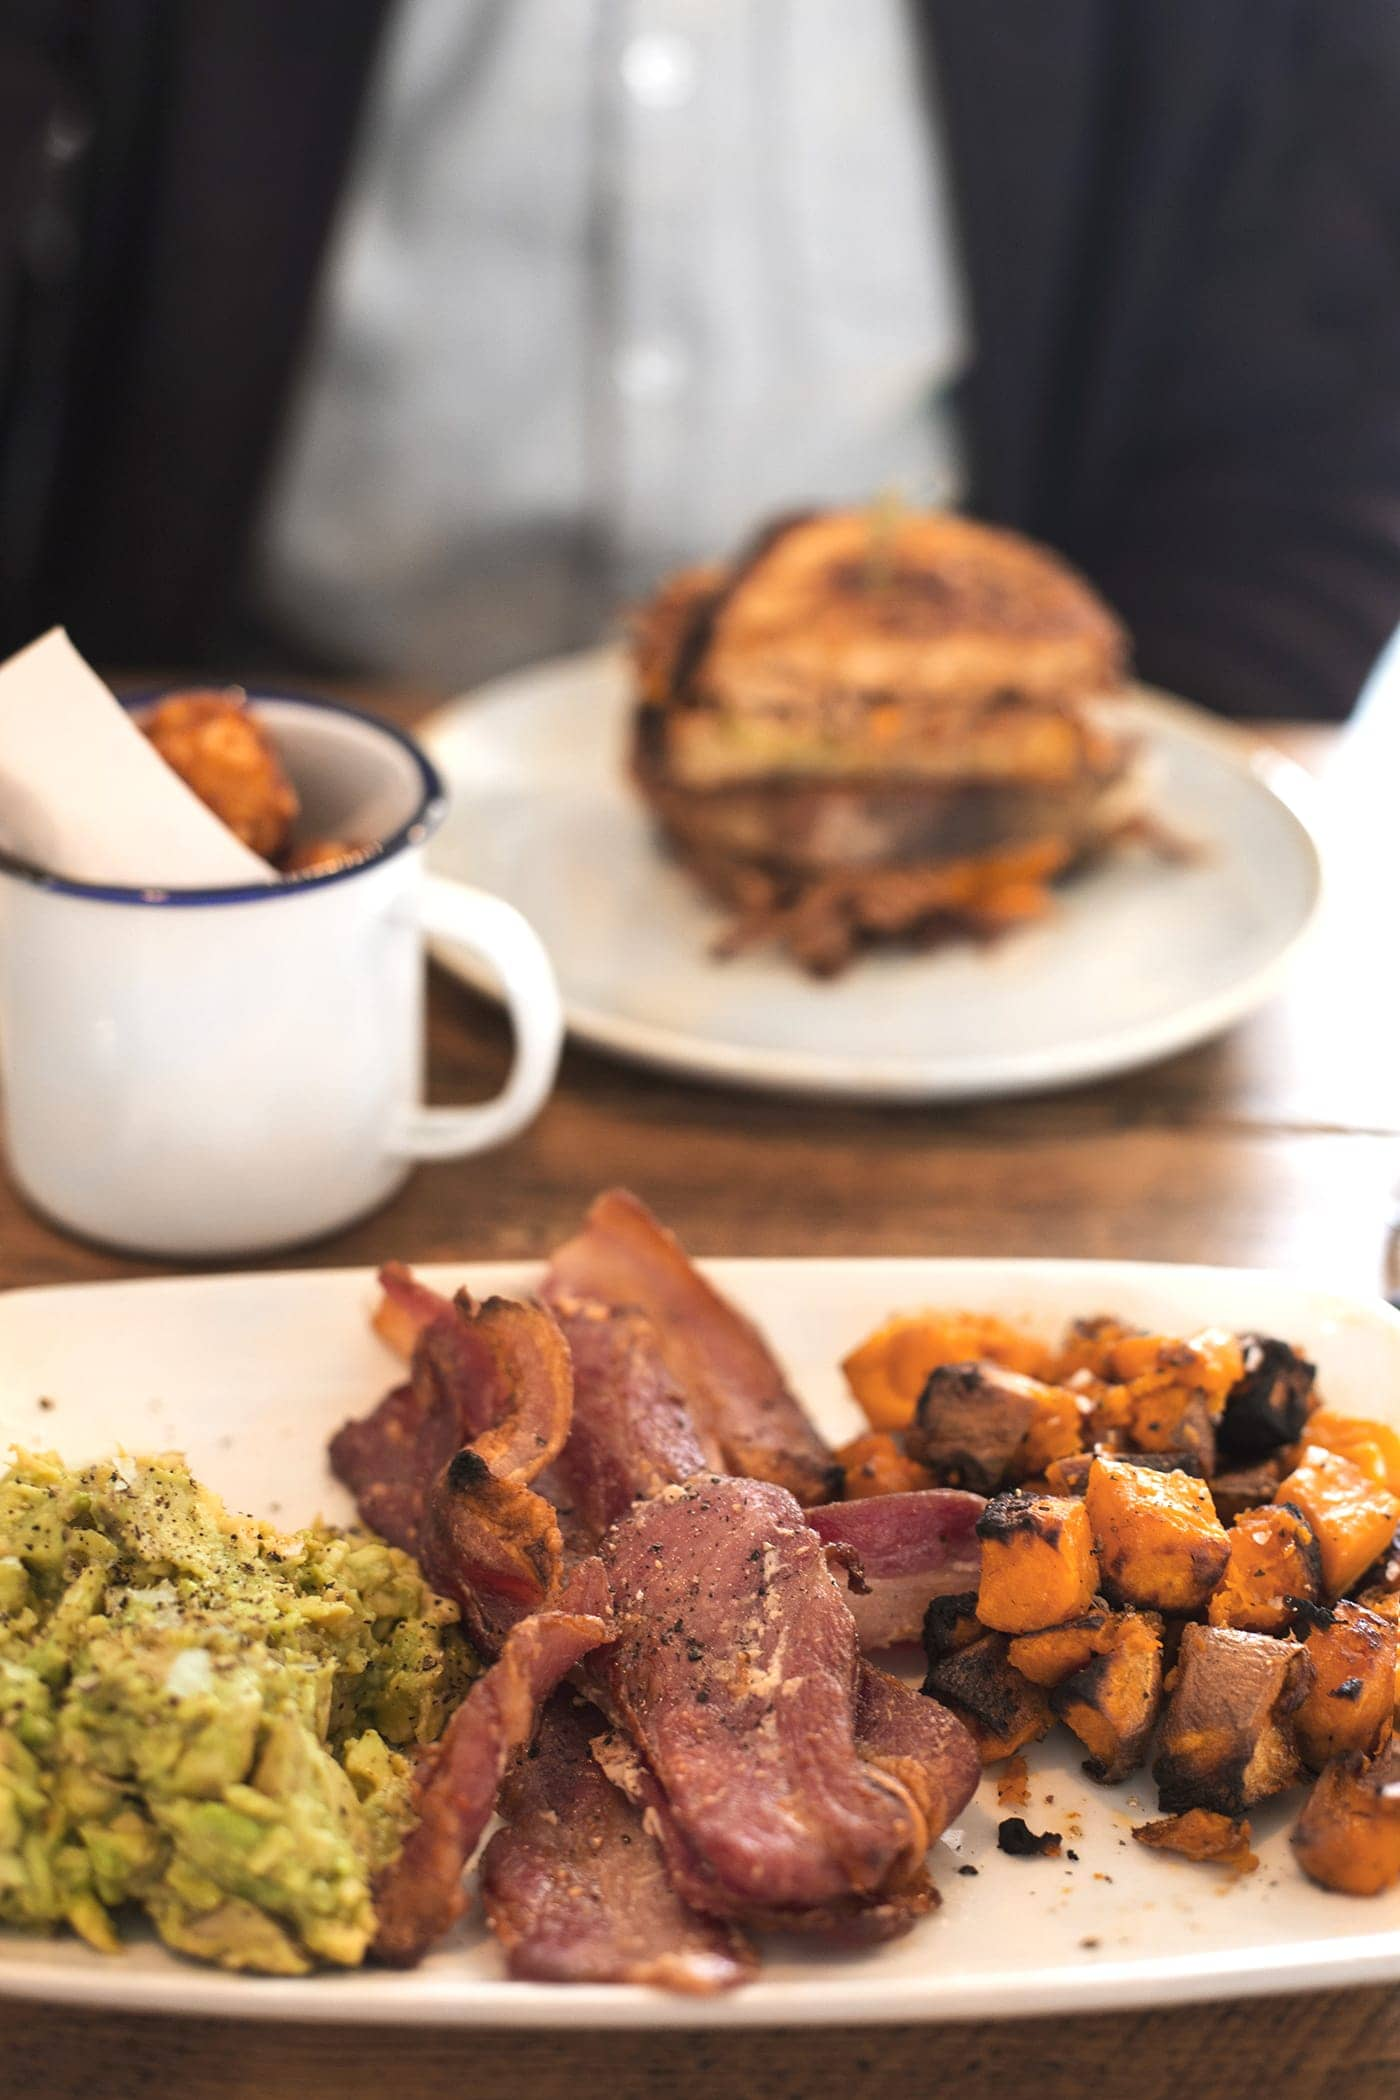 Clapham staycation | Brickwood Coffee lunch | mini break